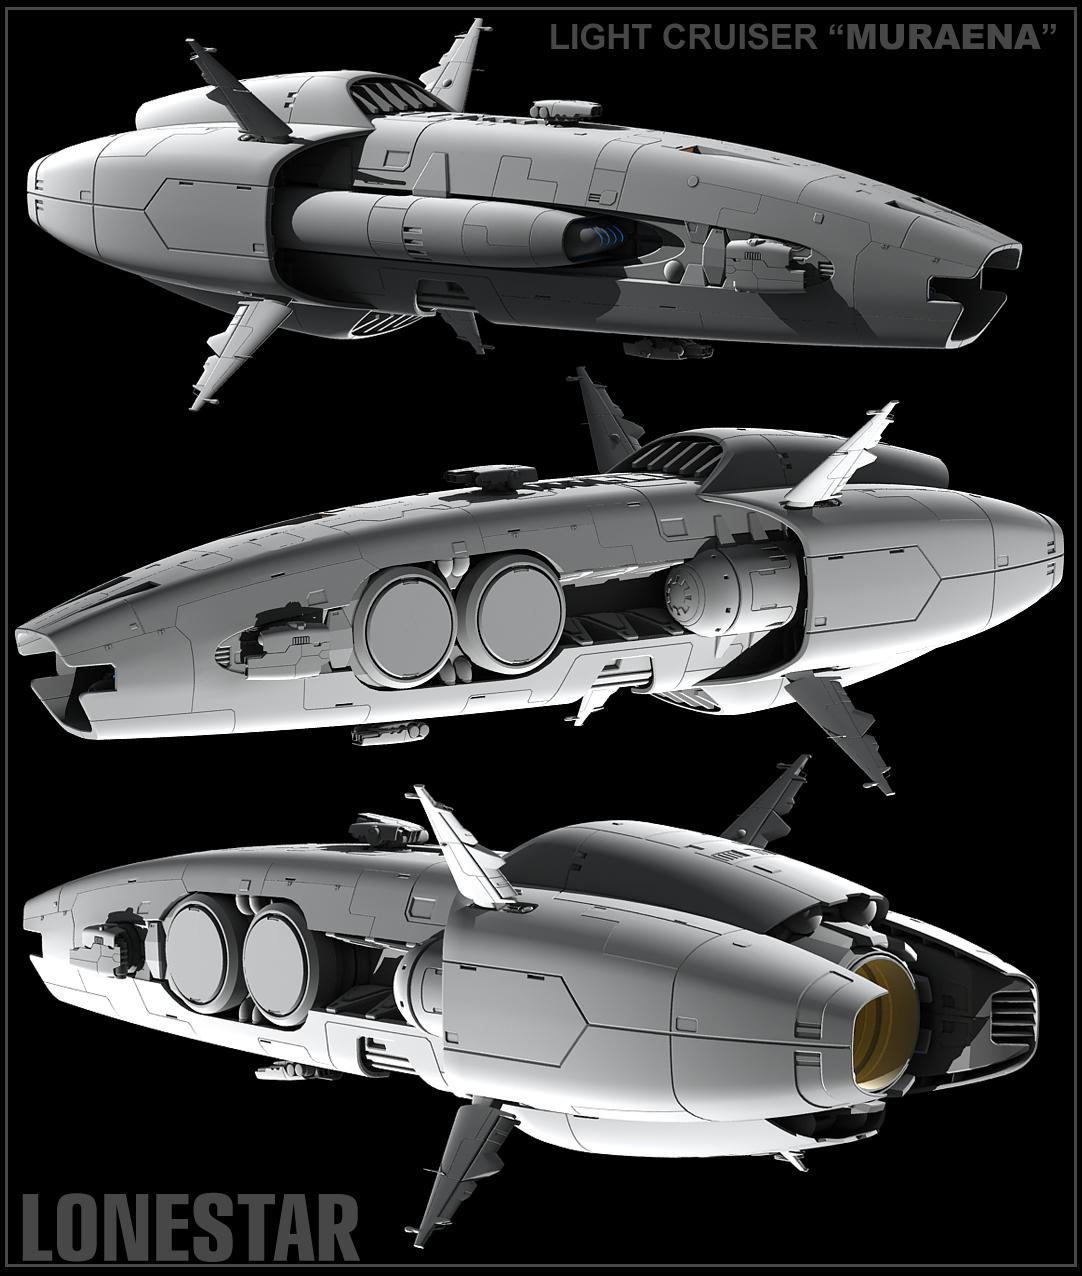 MURAENA light cruiser